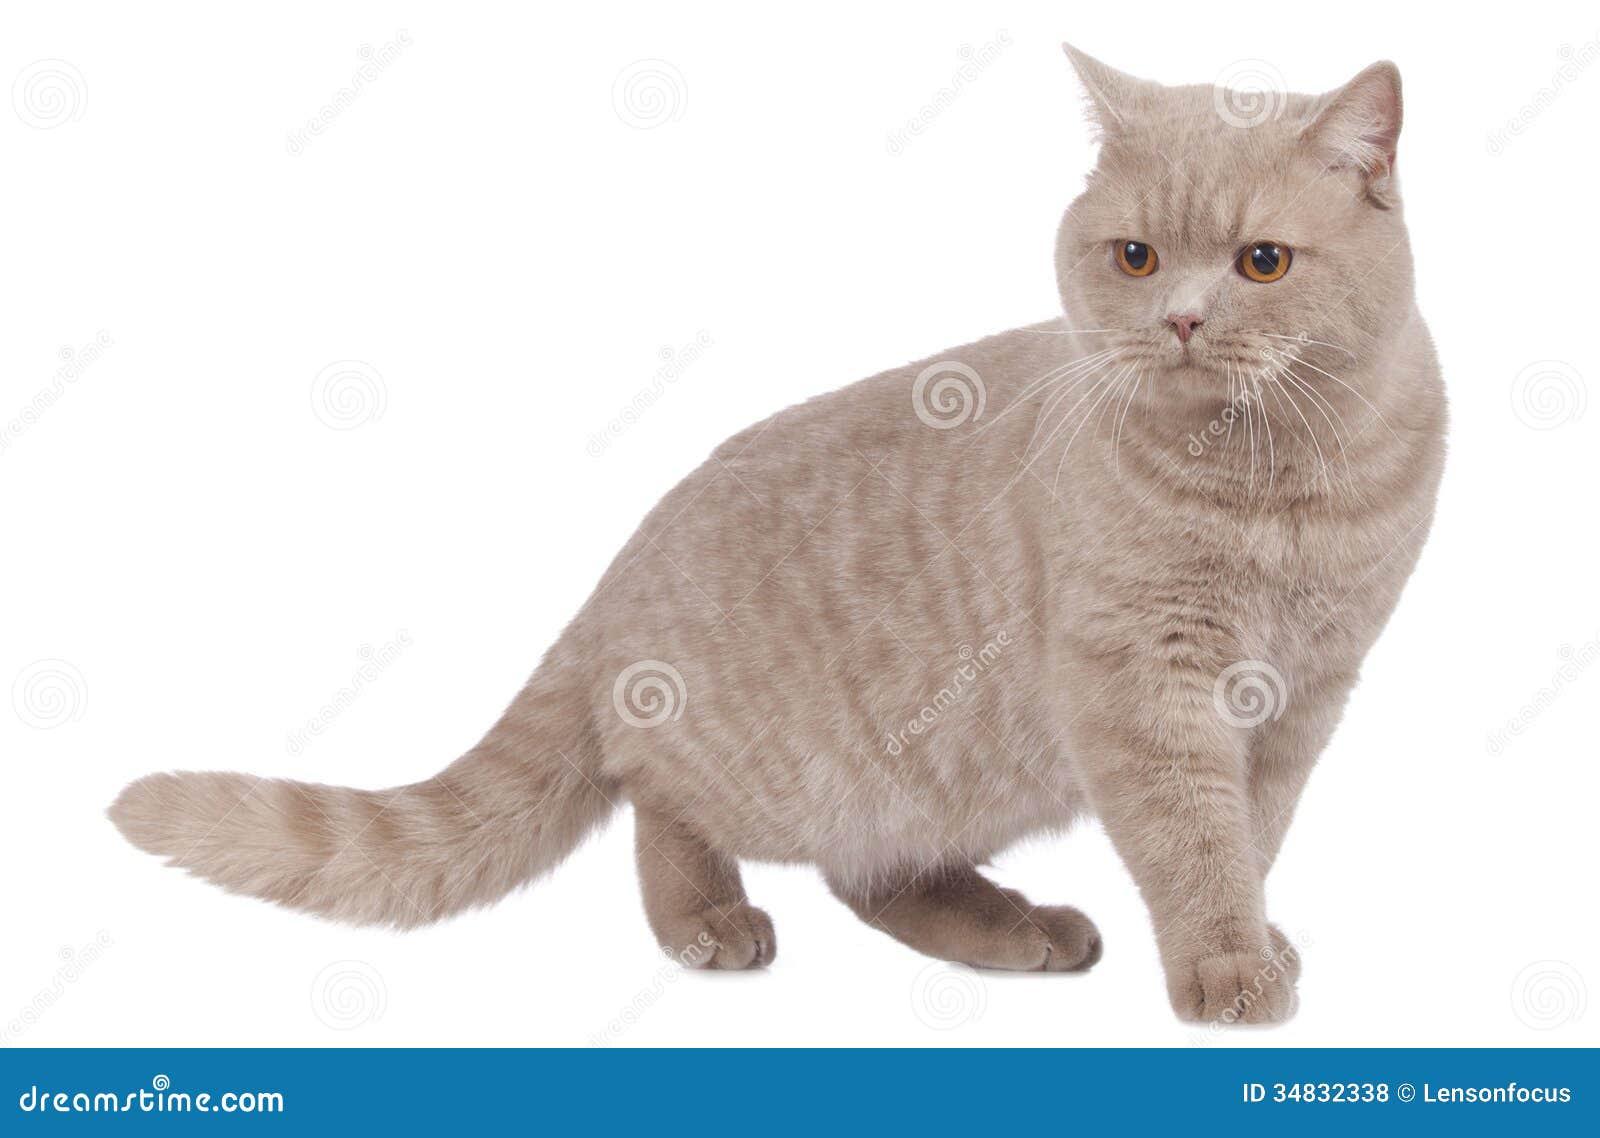 hop kitten